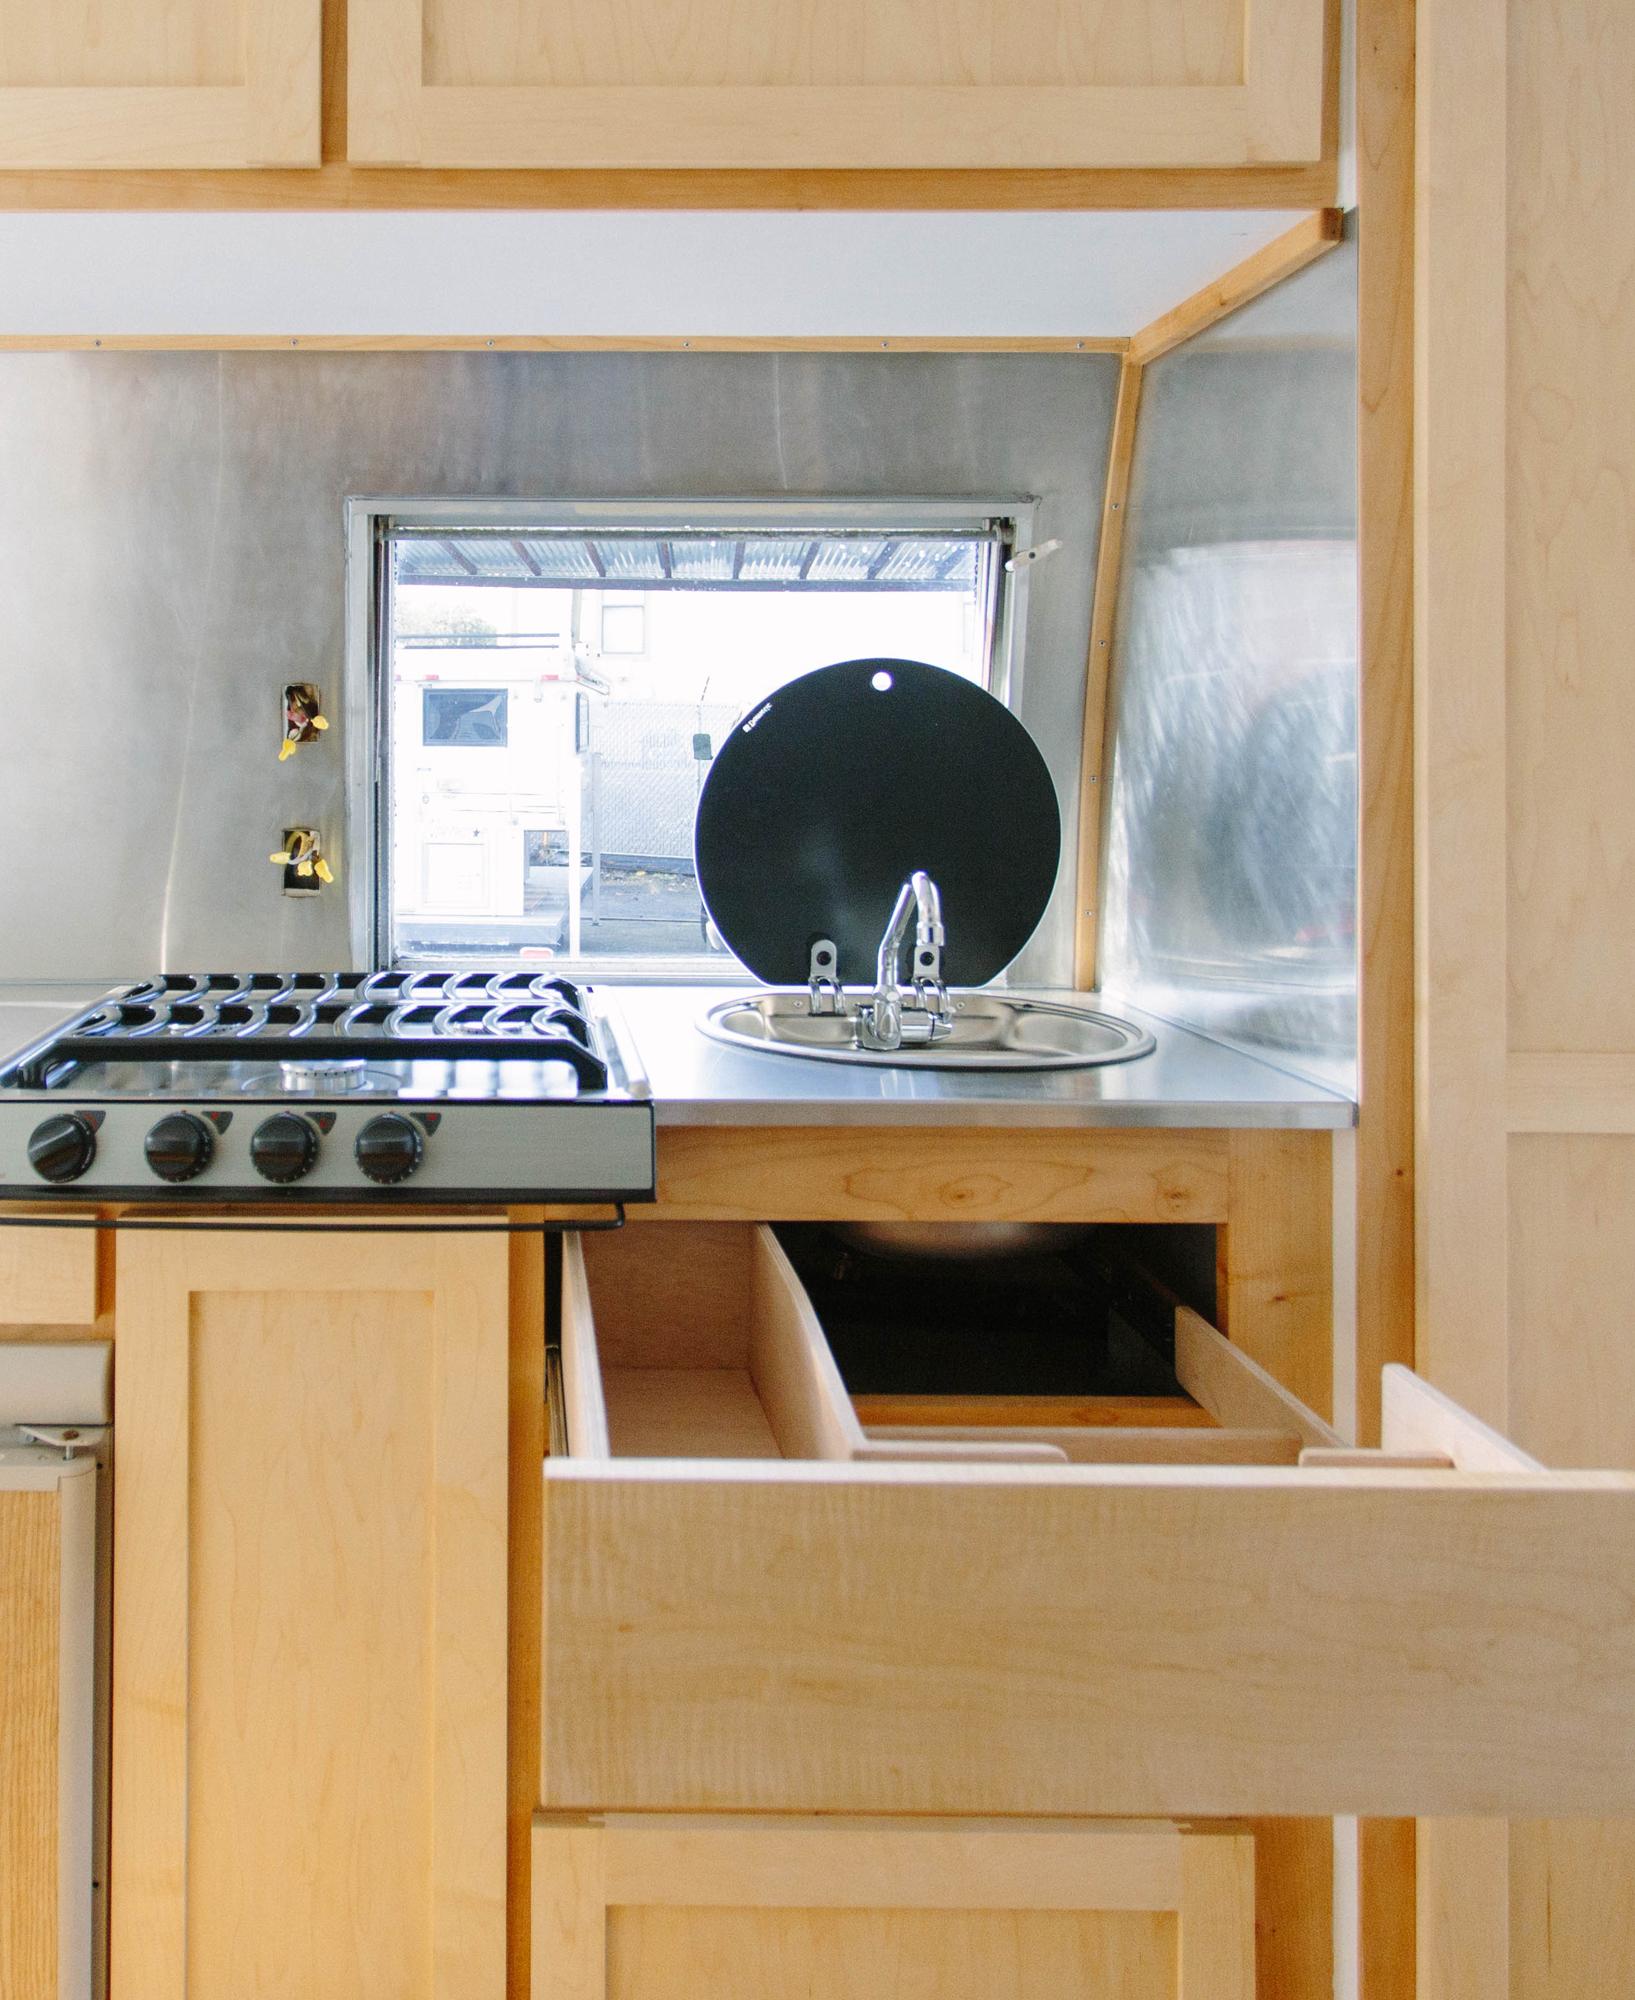 DESIGN - Re-create original layoutMaple hardwood cabinets & warm wood floorLight & bright wallsDesign forward dinette that is convertible into sleeping areaOriginal bathtub & surround fiberglass repair, restoration & painting